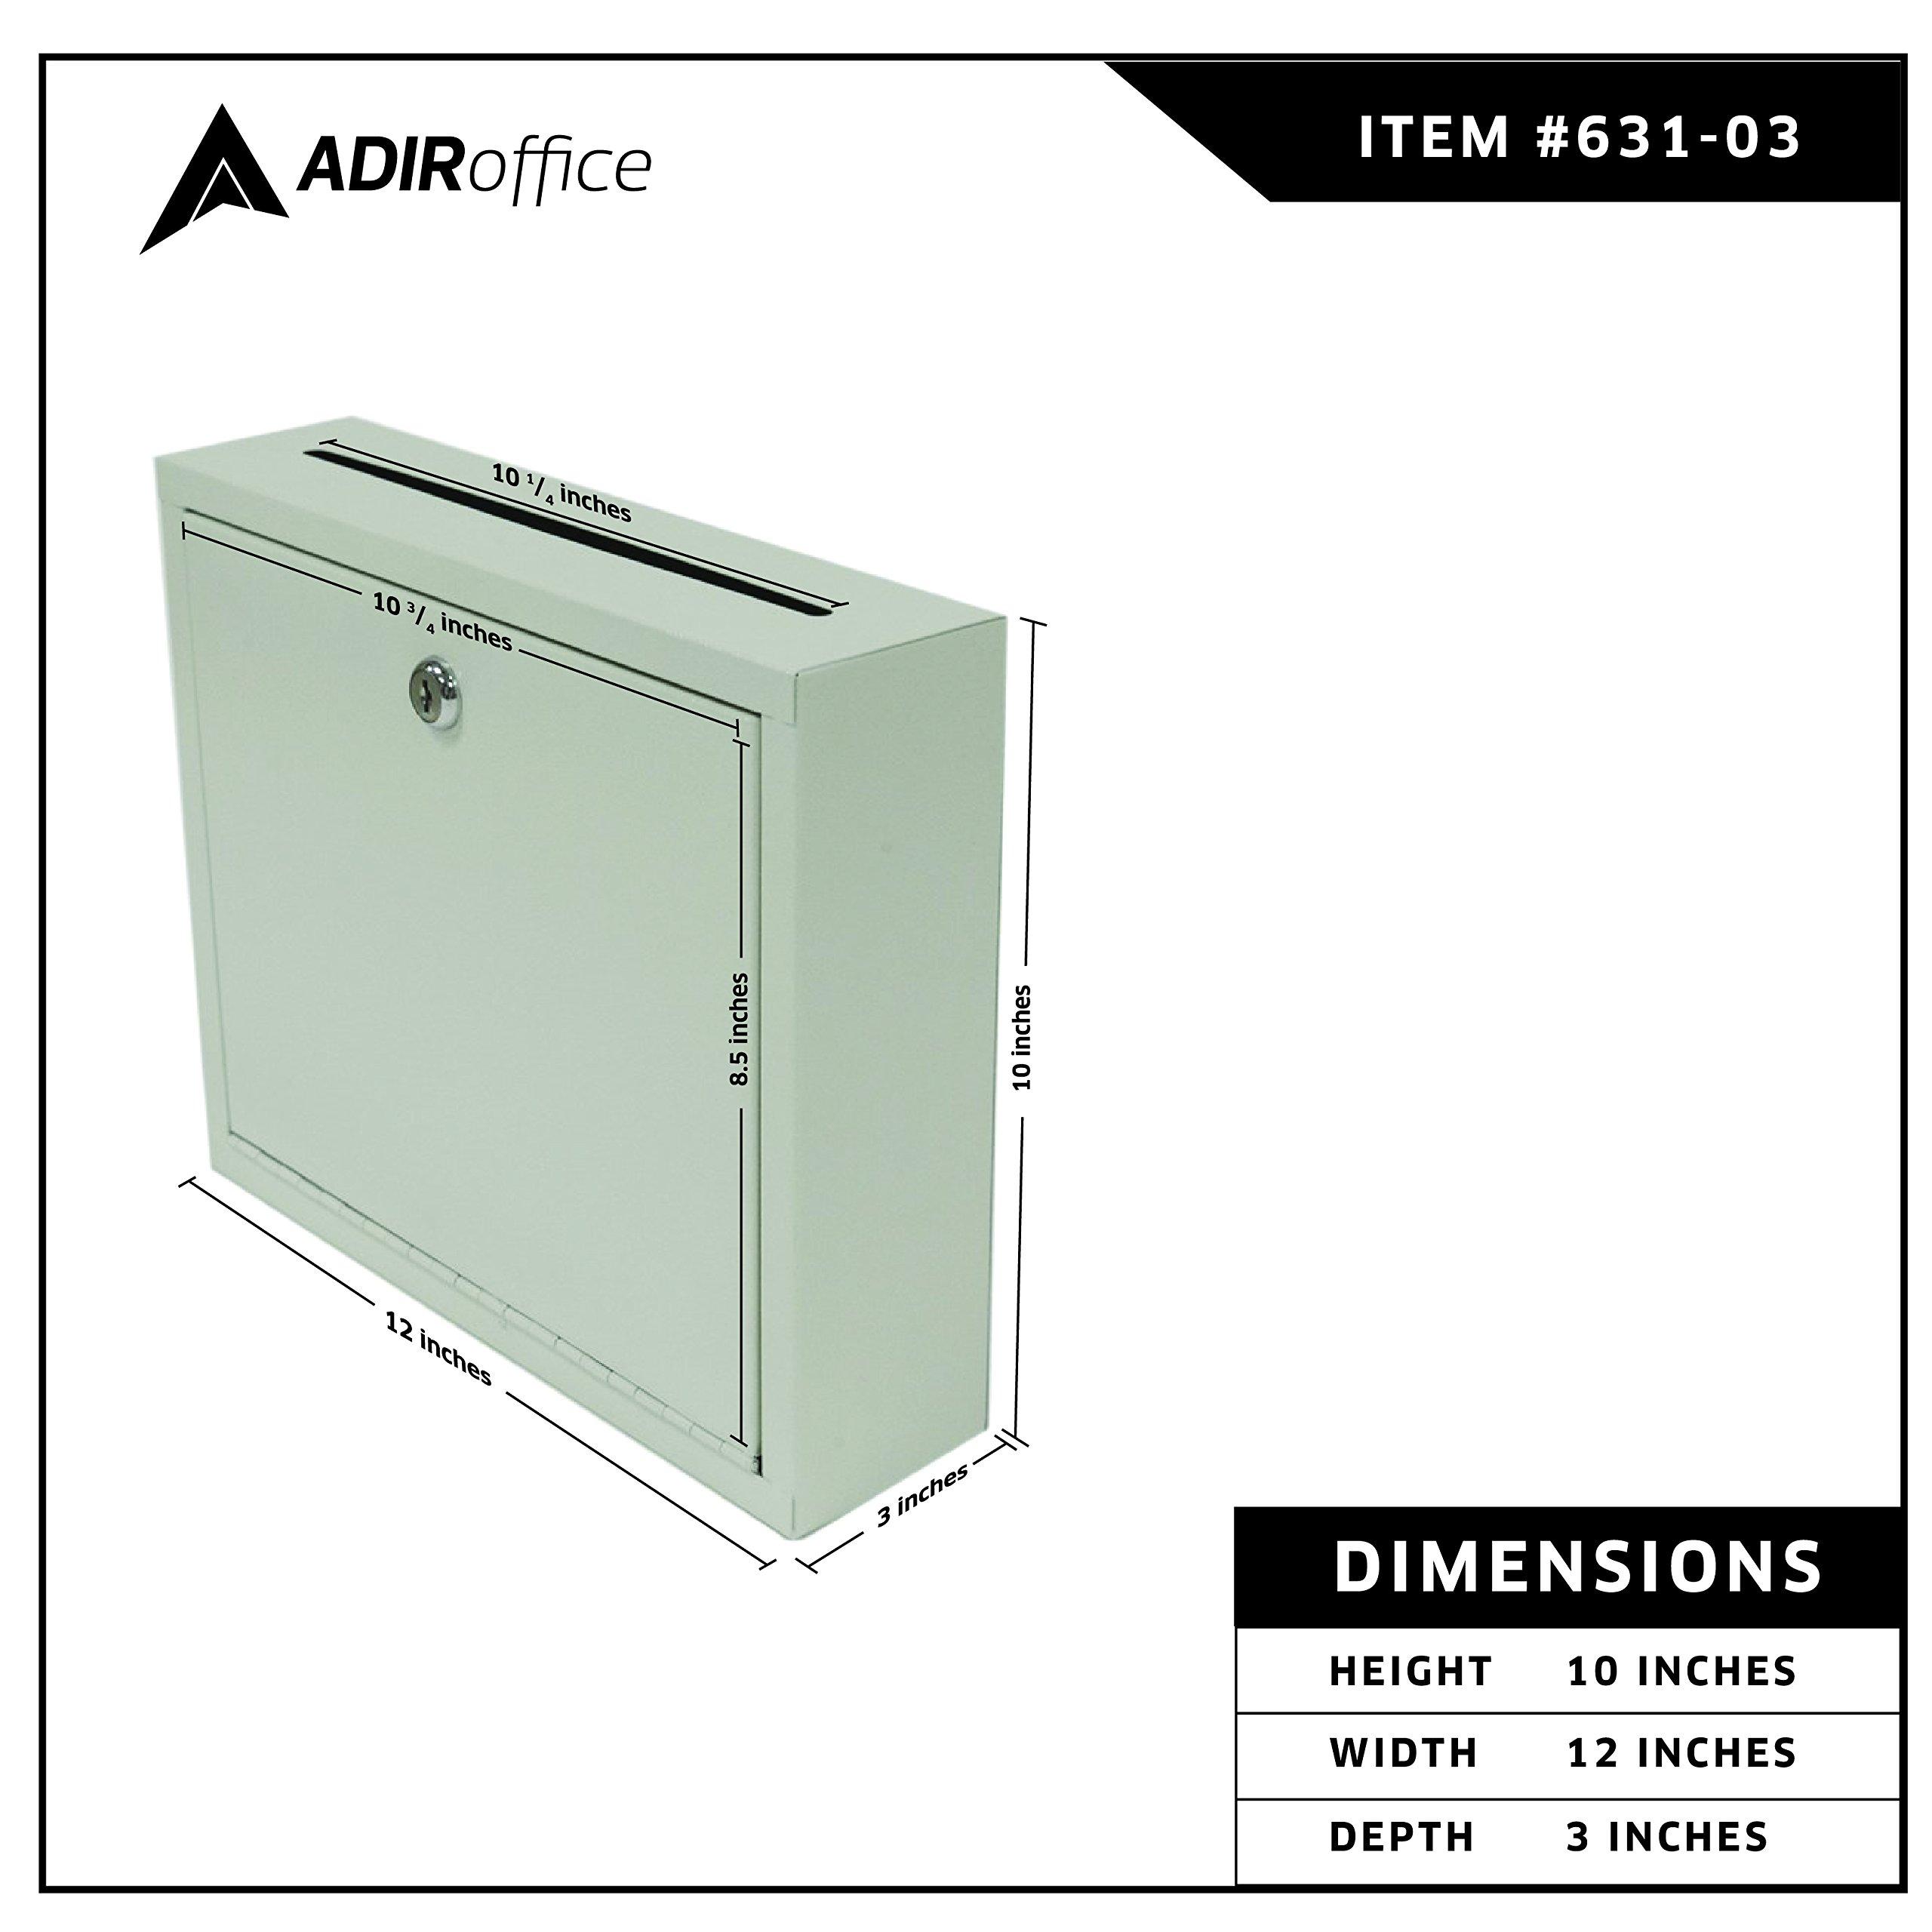 AdirOffice Multi Purpose, Mail Box, Drop Box, Suggestion Box, Wall Mountable, 3'' x 10'' x 12'' - Sand Beige by Adir Corp. (Image #3)